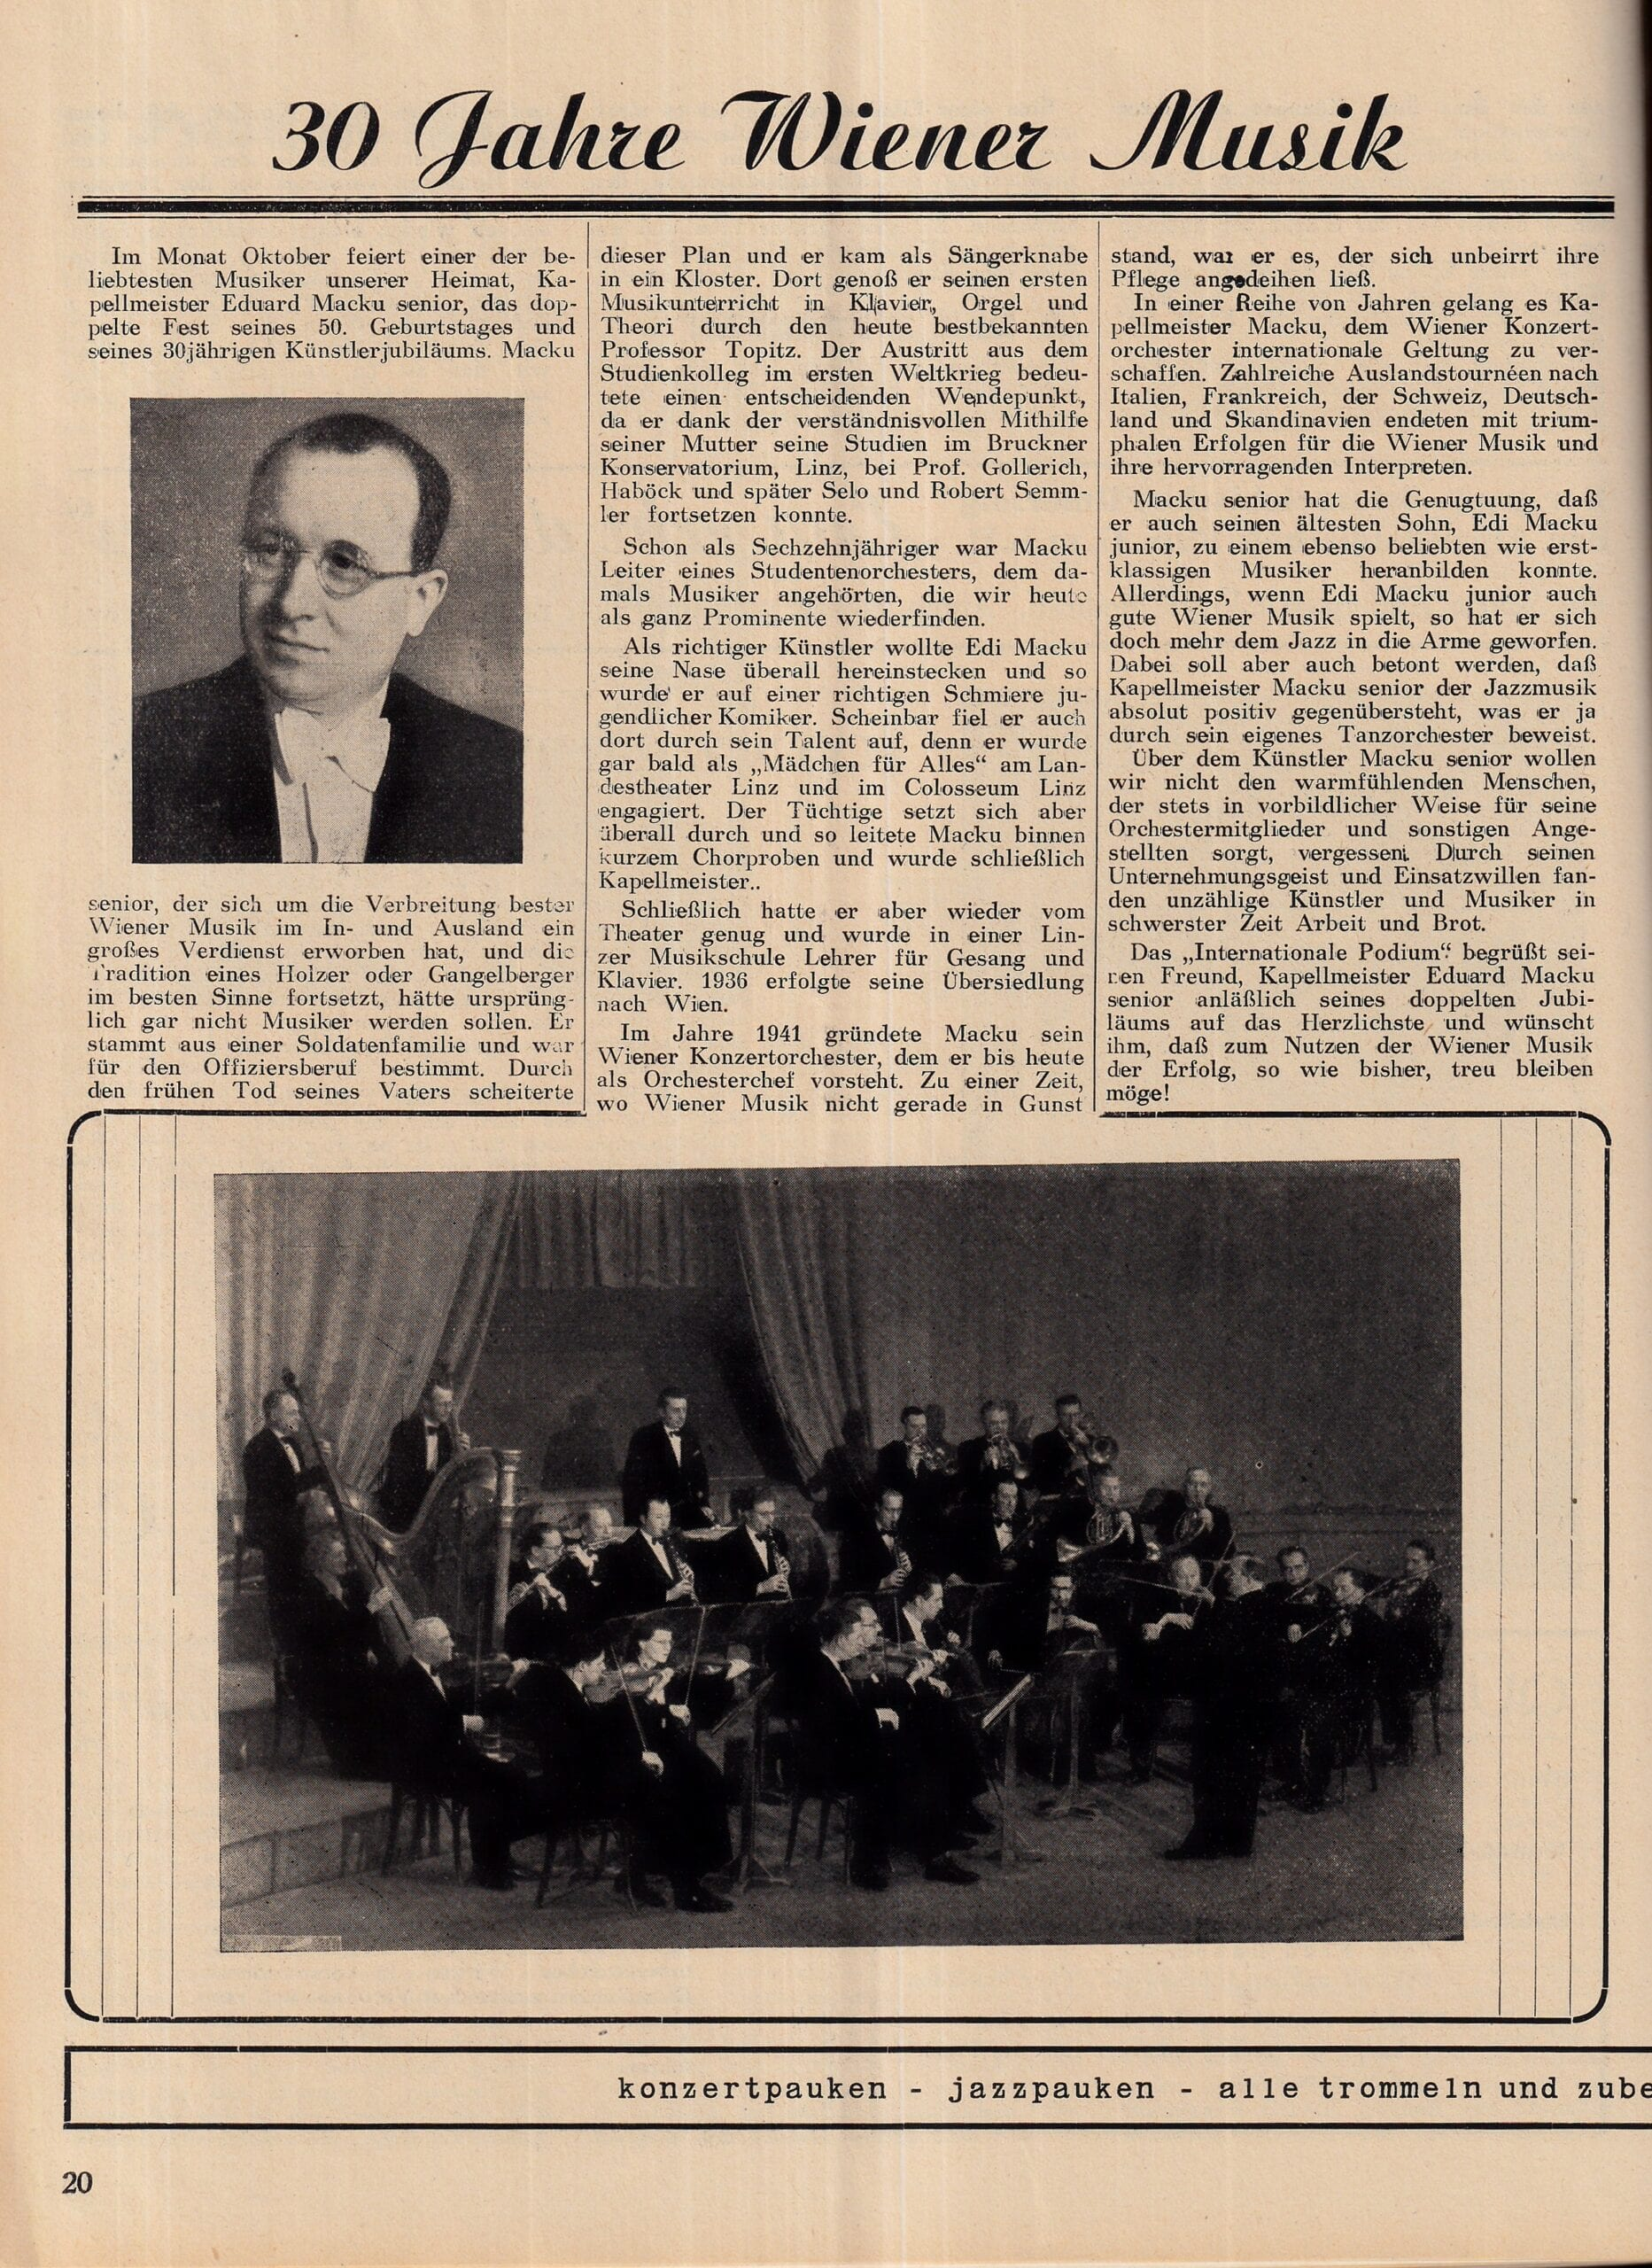 1951 Okt. – Podium